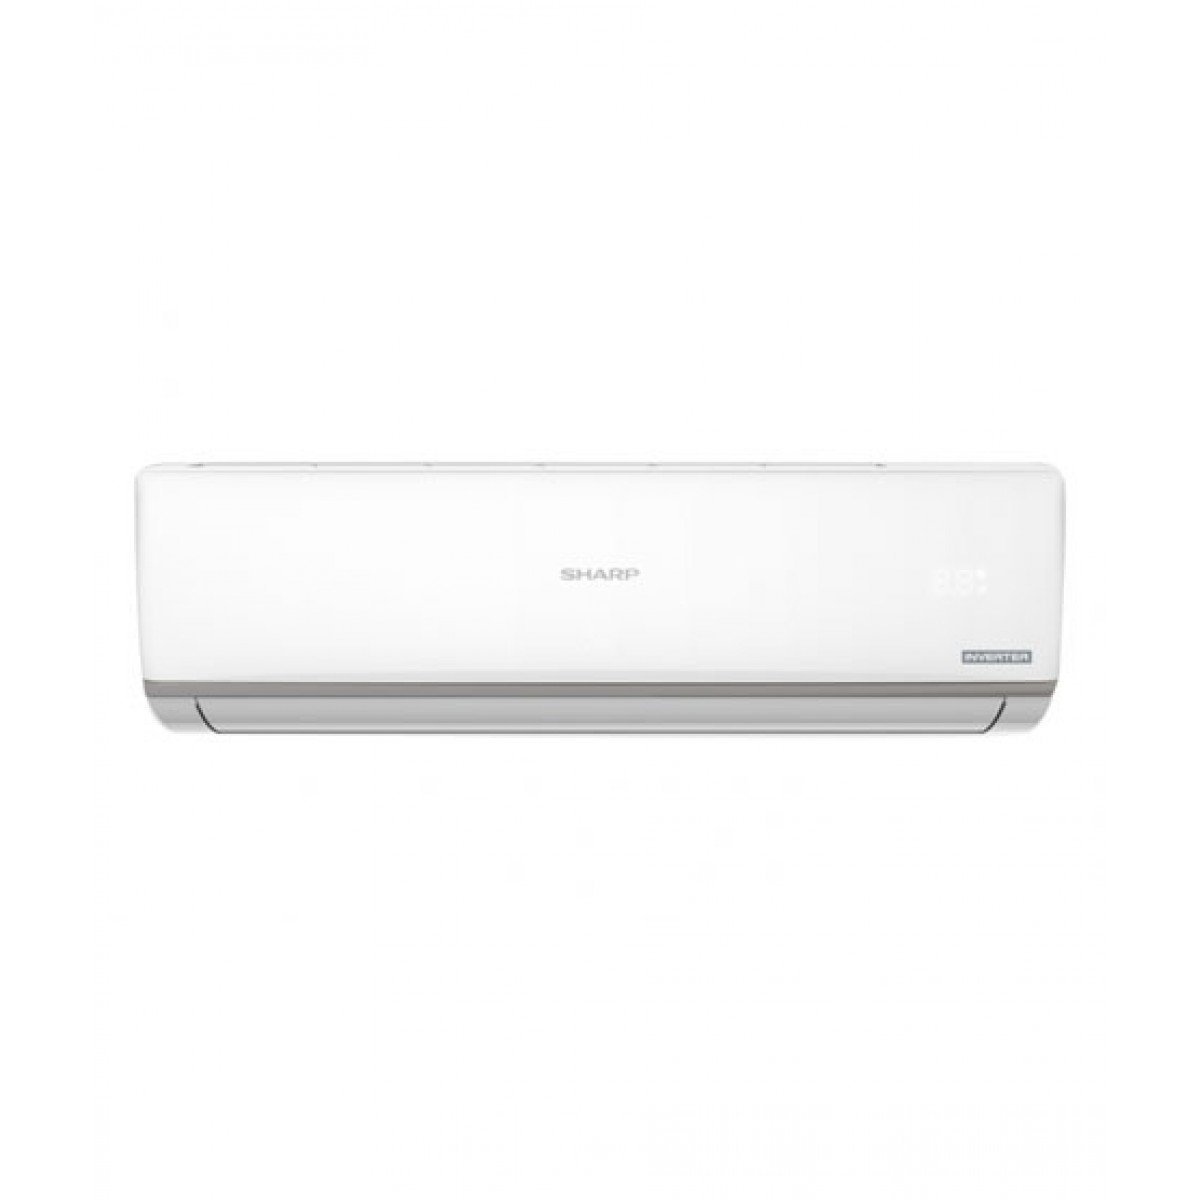 Sharp 1.5 Ton Inverter AC Heat and Cool AYX18HCP